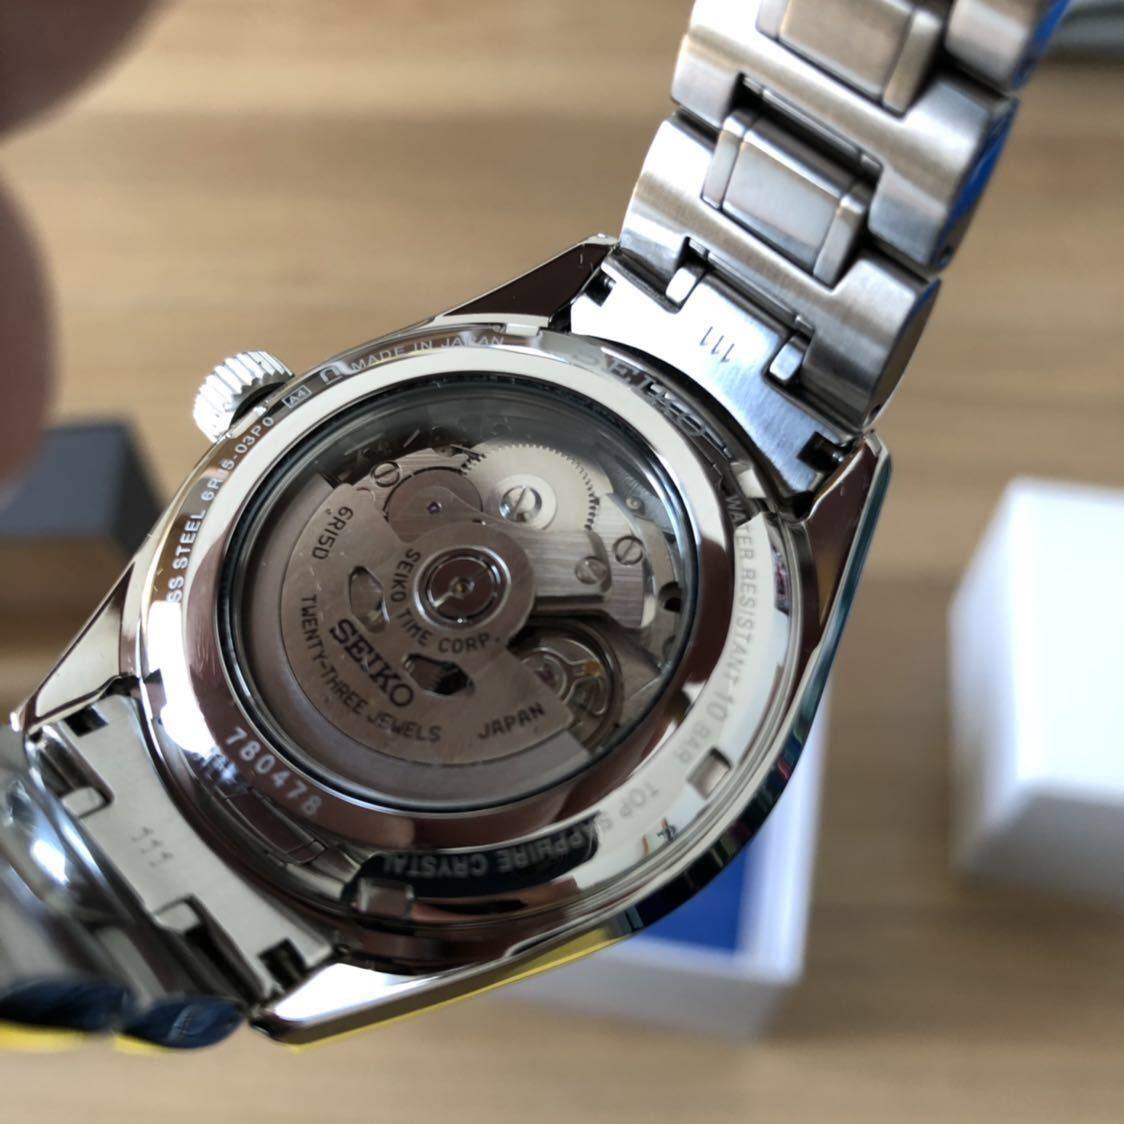 SEIKO PRESAGE SARX035 セイコー プレザージュ 機械式 メカニカル 腕時計 自動巻_画像7